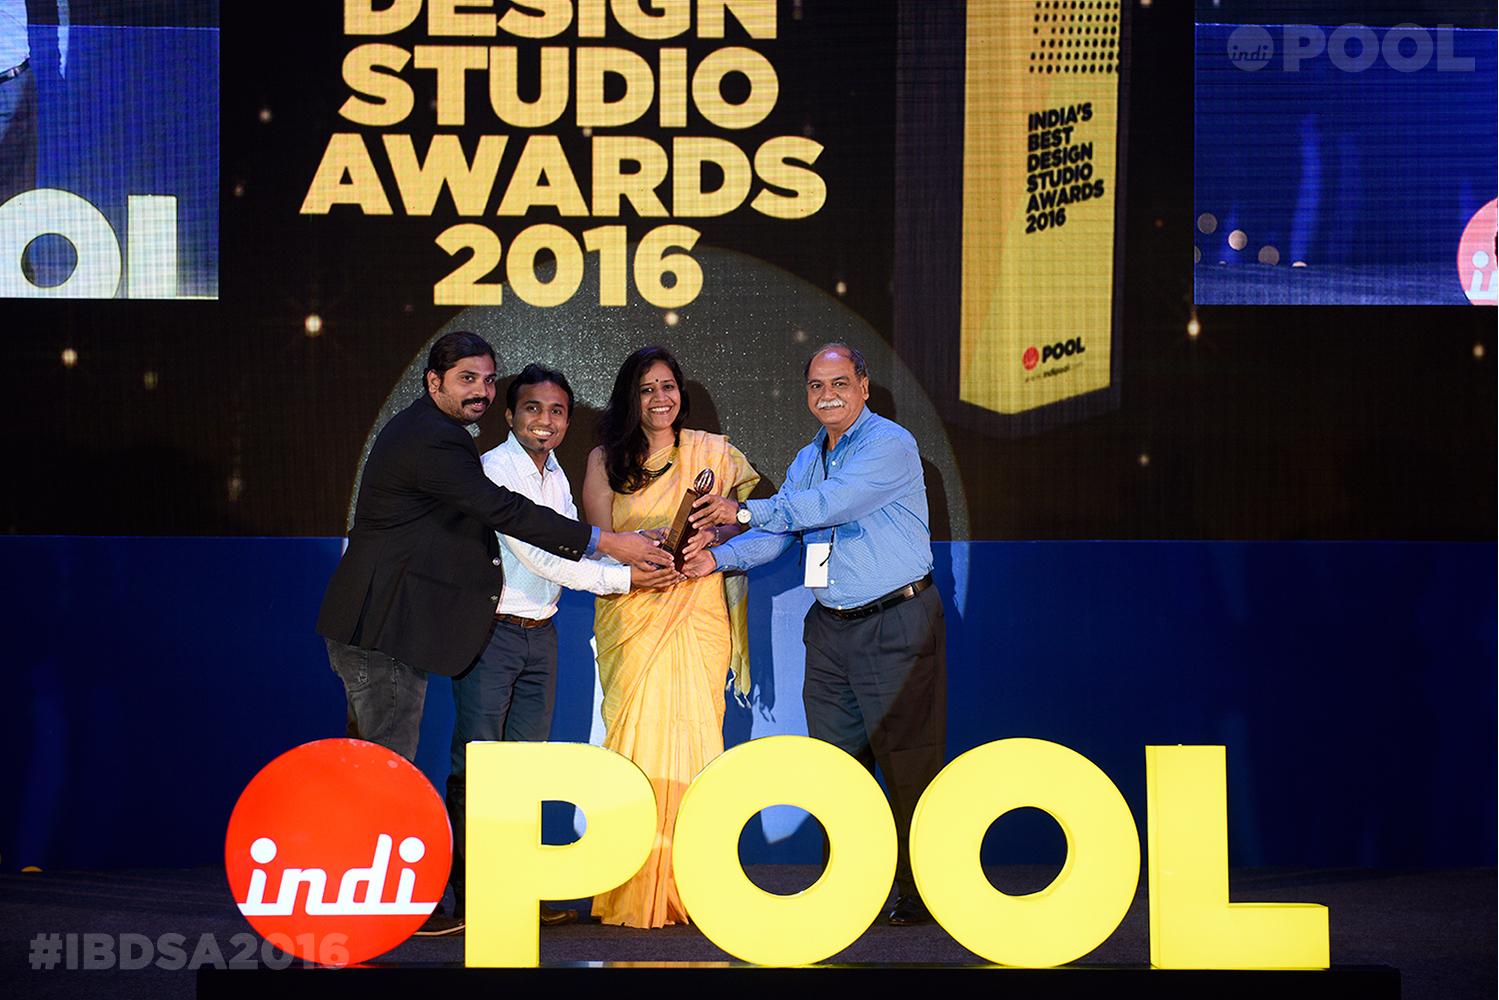 India's Best Packaging Design Studio 2016 - WOW Design